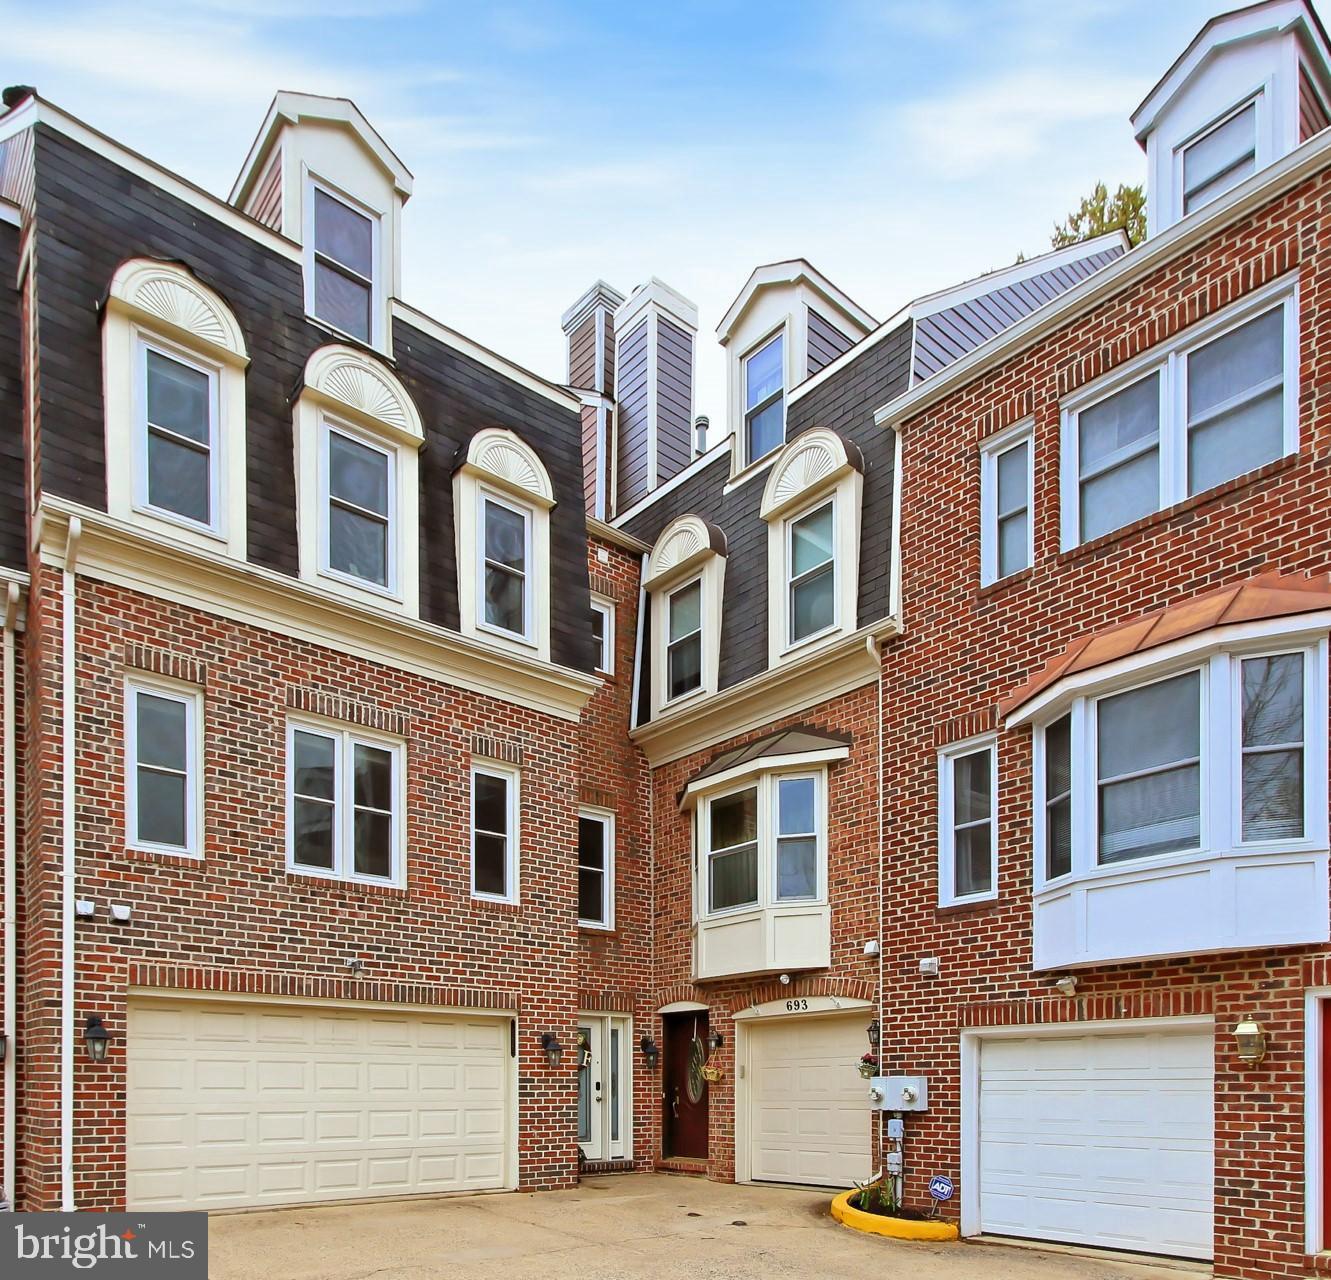 689 GLEBE ROAD, ALEXANDRIA, Virginia 22305, 4 Bedrooms Bedrooms, ,4 BathroomsBathrooms,Residential,For Sale,Courtland Manor at Sunnyside,GLEBE,VAAX258192